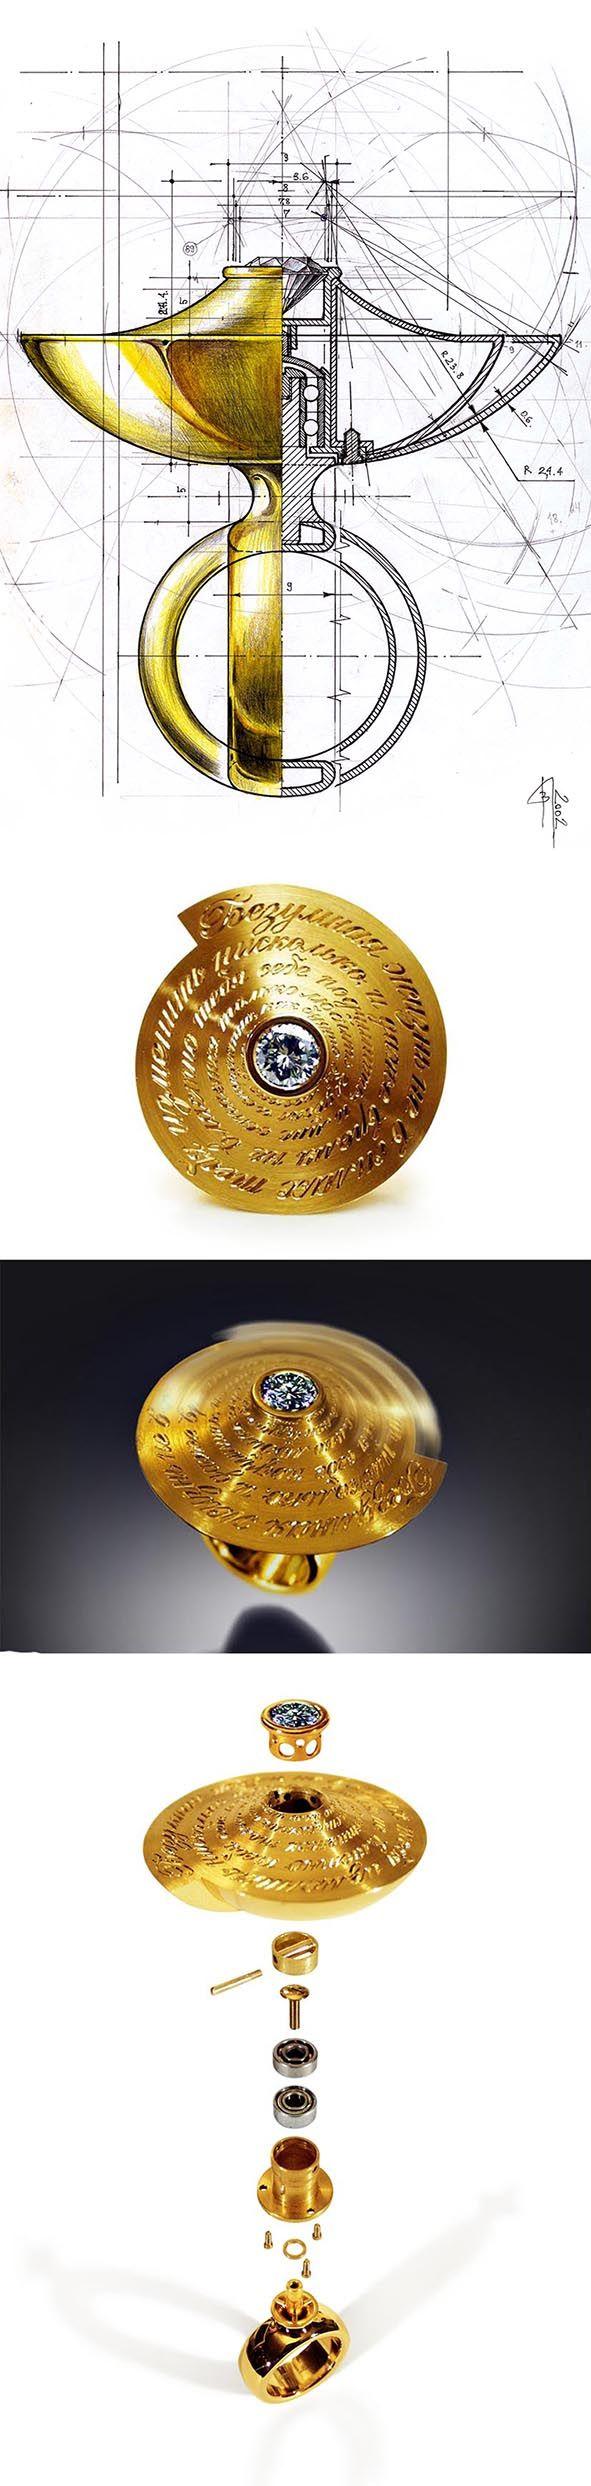 "VLAD GLYNIN jewellery - vladglynin.com - Ring ""Rotation"", 2003. Yellow gold, titanium, steel (bearings), diamond. The top of the ring is spinning / Кольцо ""Вращение"", 2003 г. Жёлтое золото, титан, сталь (подшипники), бриллиант. Верхушка кольца вращается / Anello ""Rotazione"", 2003. Oro giallo, titanio, acciaio (cuscinetto), diamante. La parte superiore si ruota"